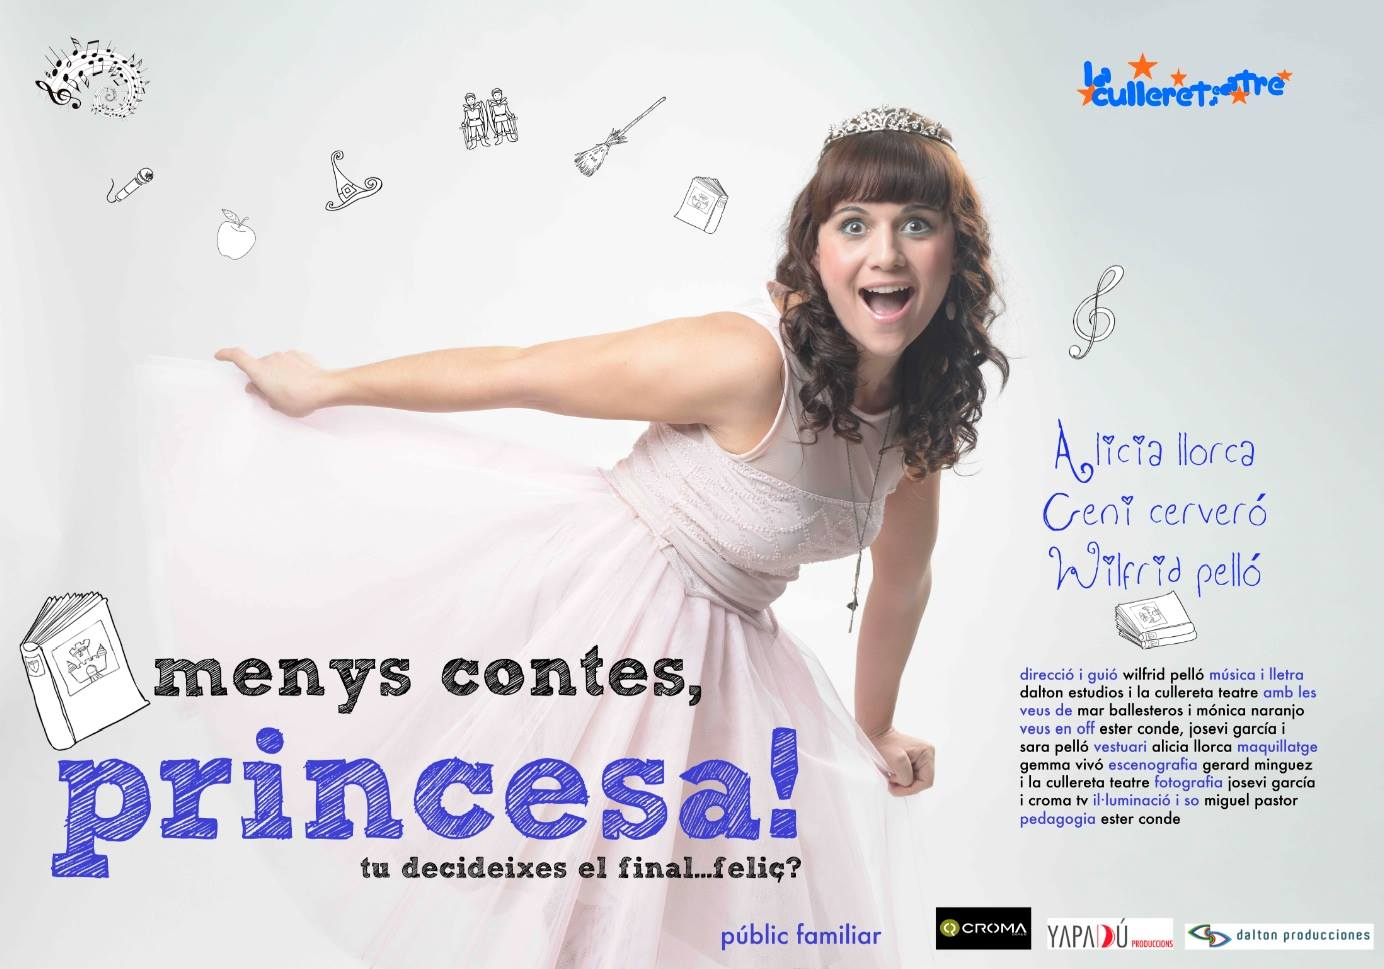 menys contes, princesa